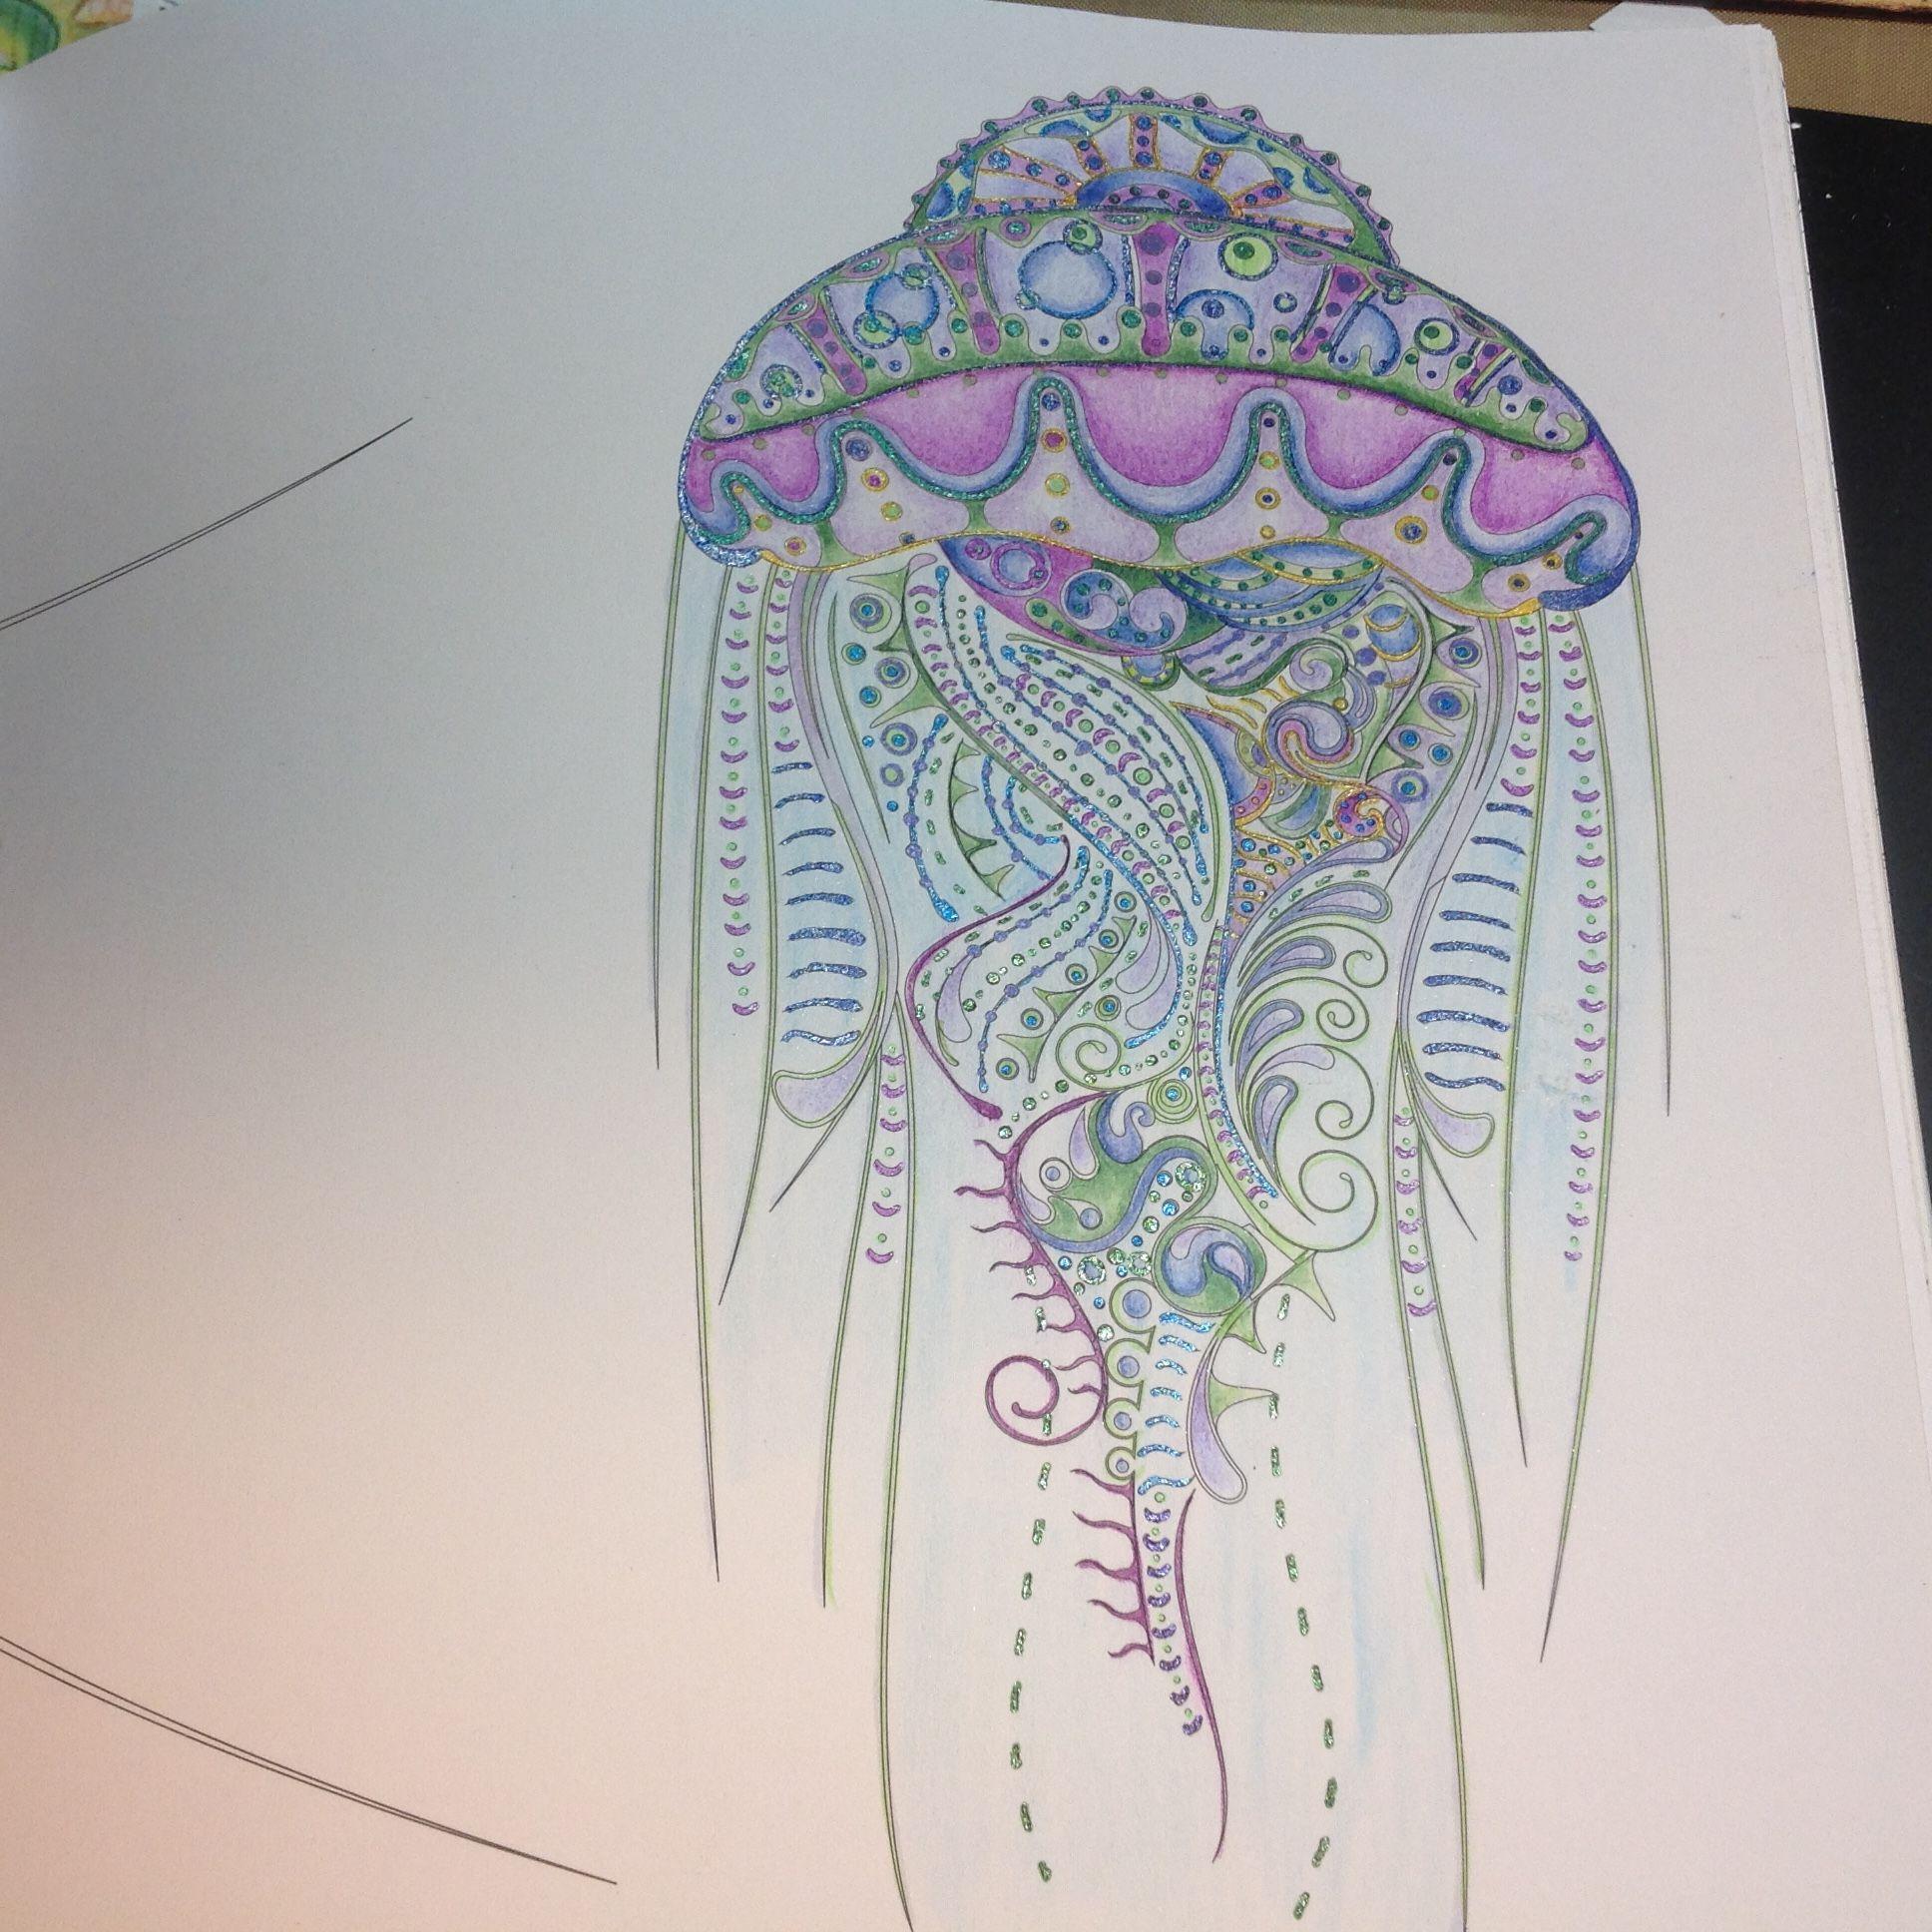 Stress free coloring book - Anti Stress Free Coloring Book Explore Free Coloring Coloring Books And More Jellyfish From Atlantis